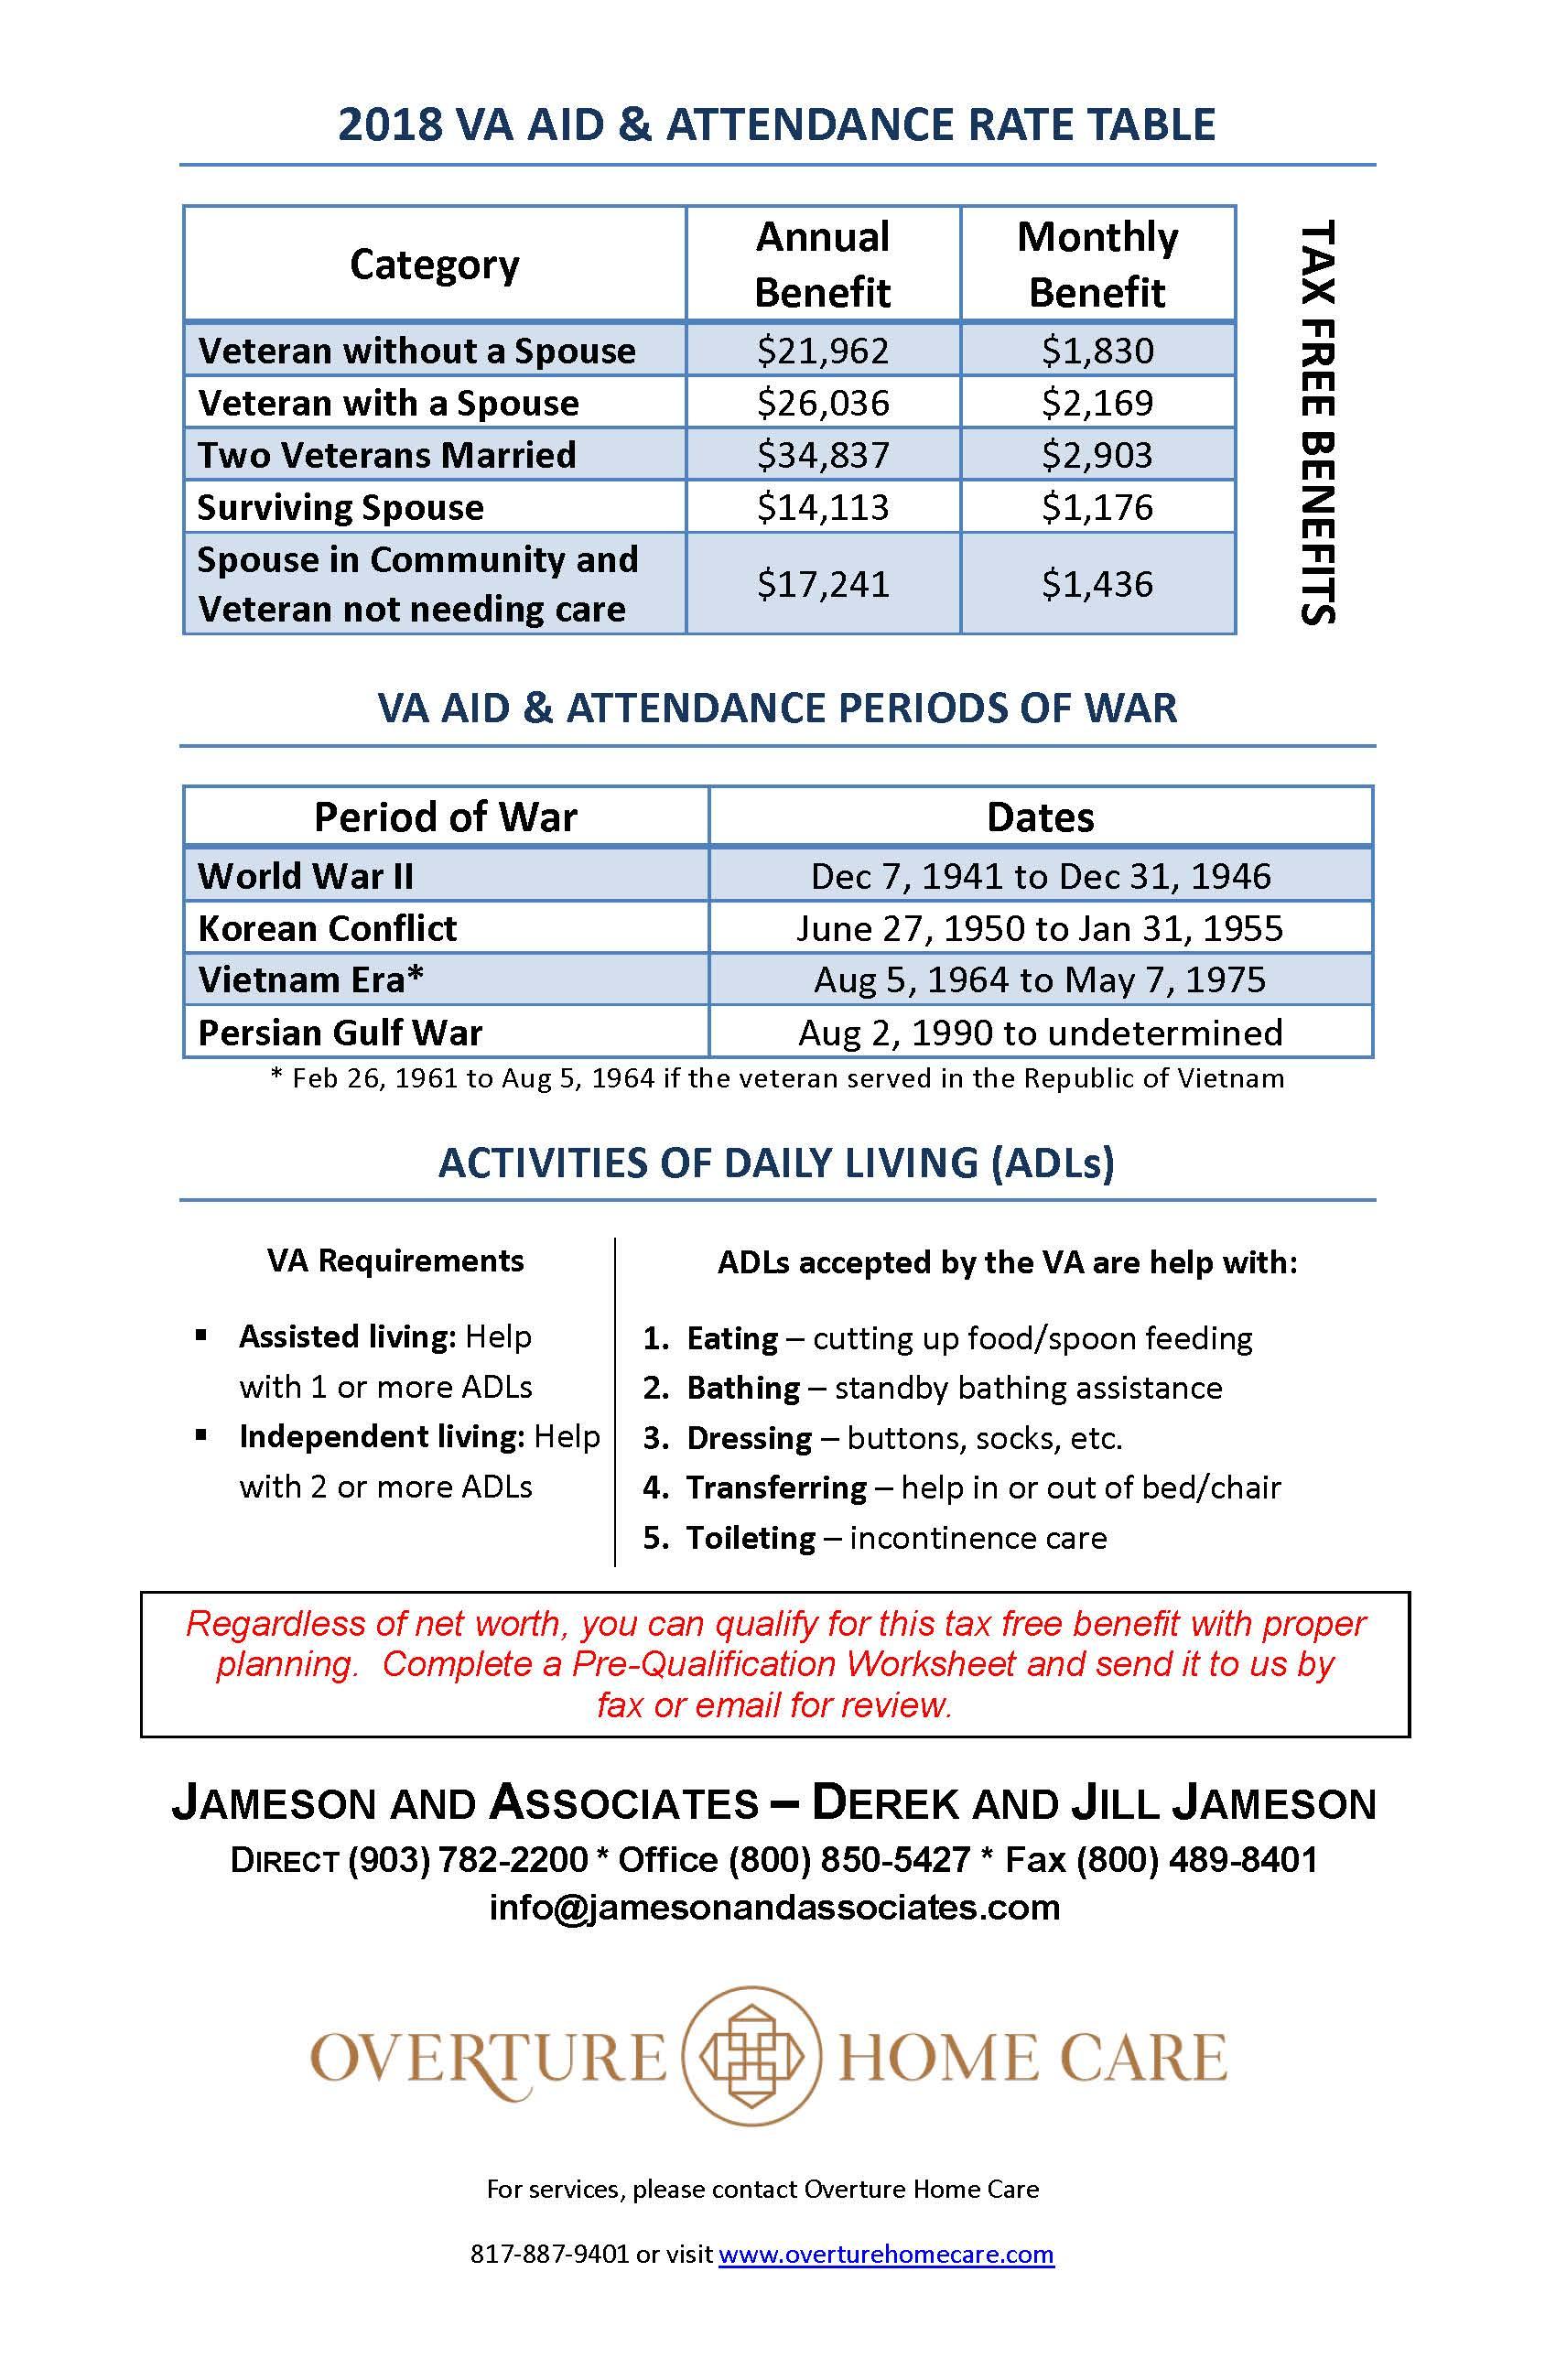 2018 VA Rate Table 07-18 New.jpg